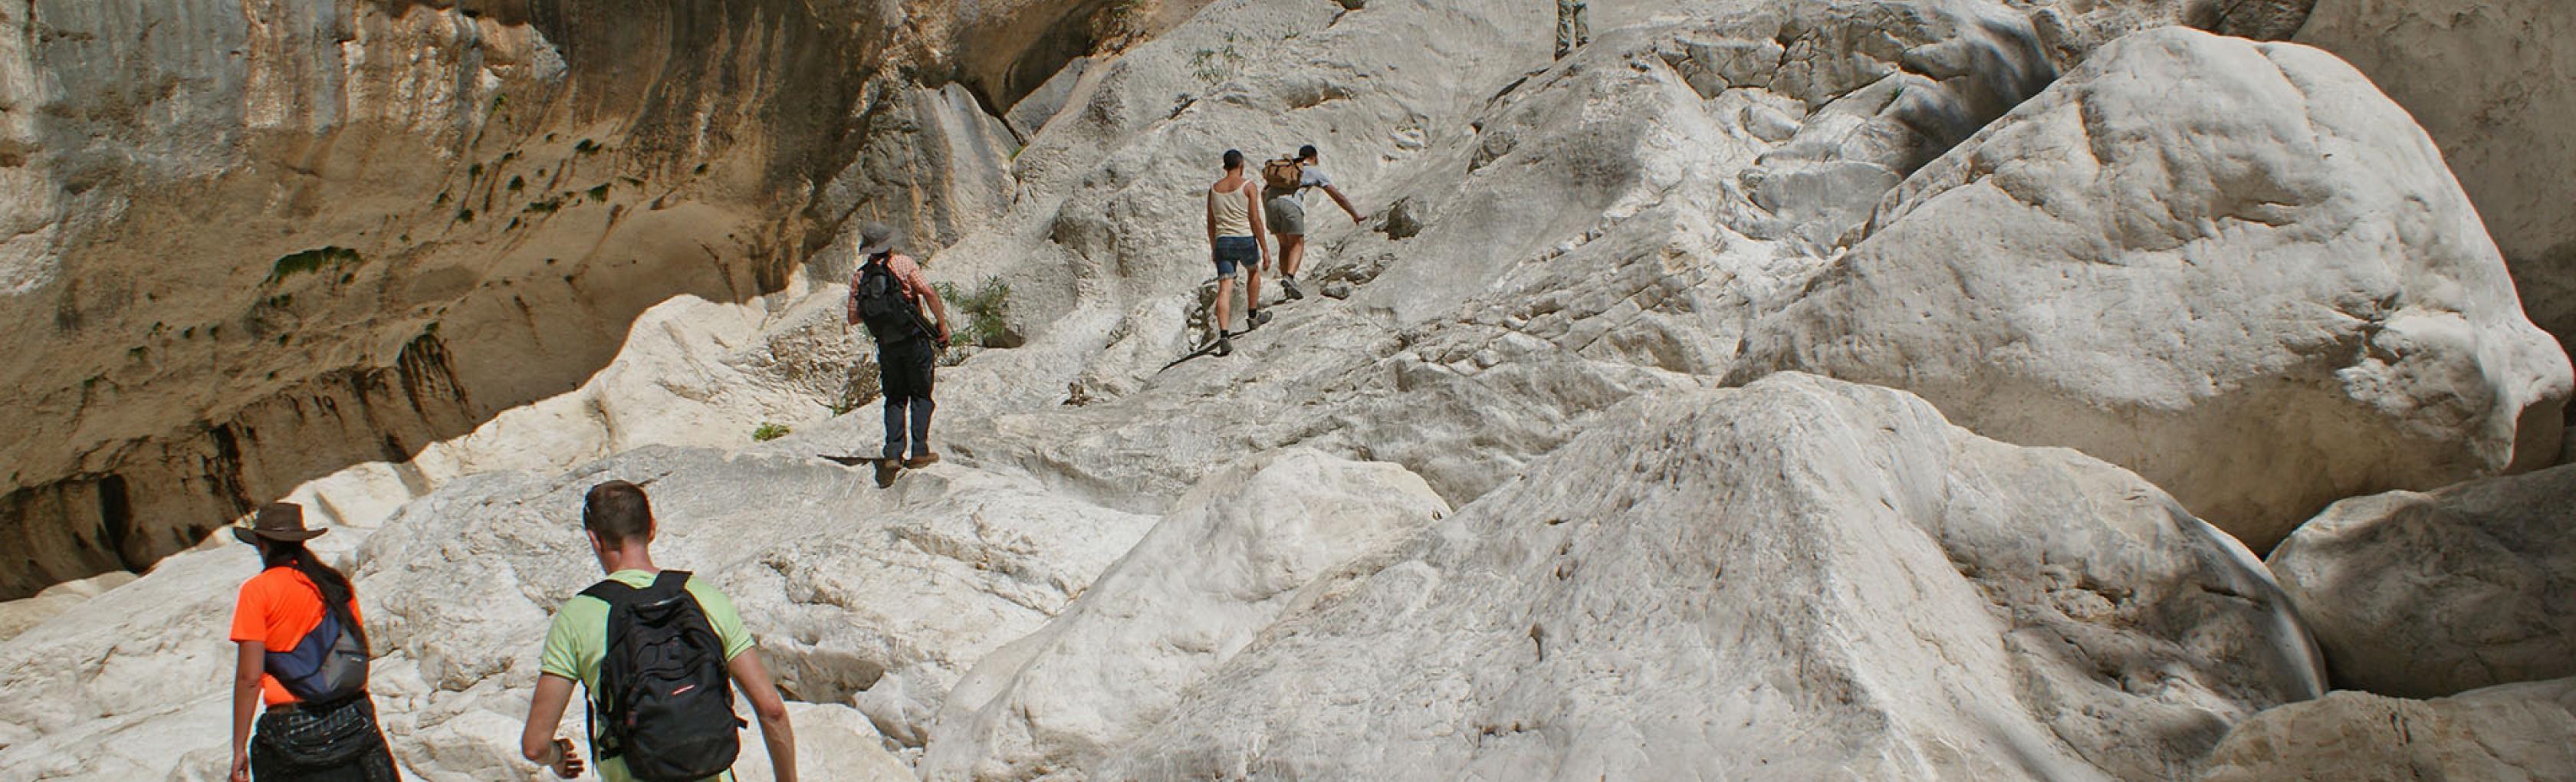 Trekking in Sardegna